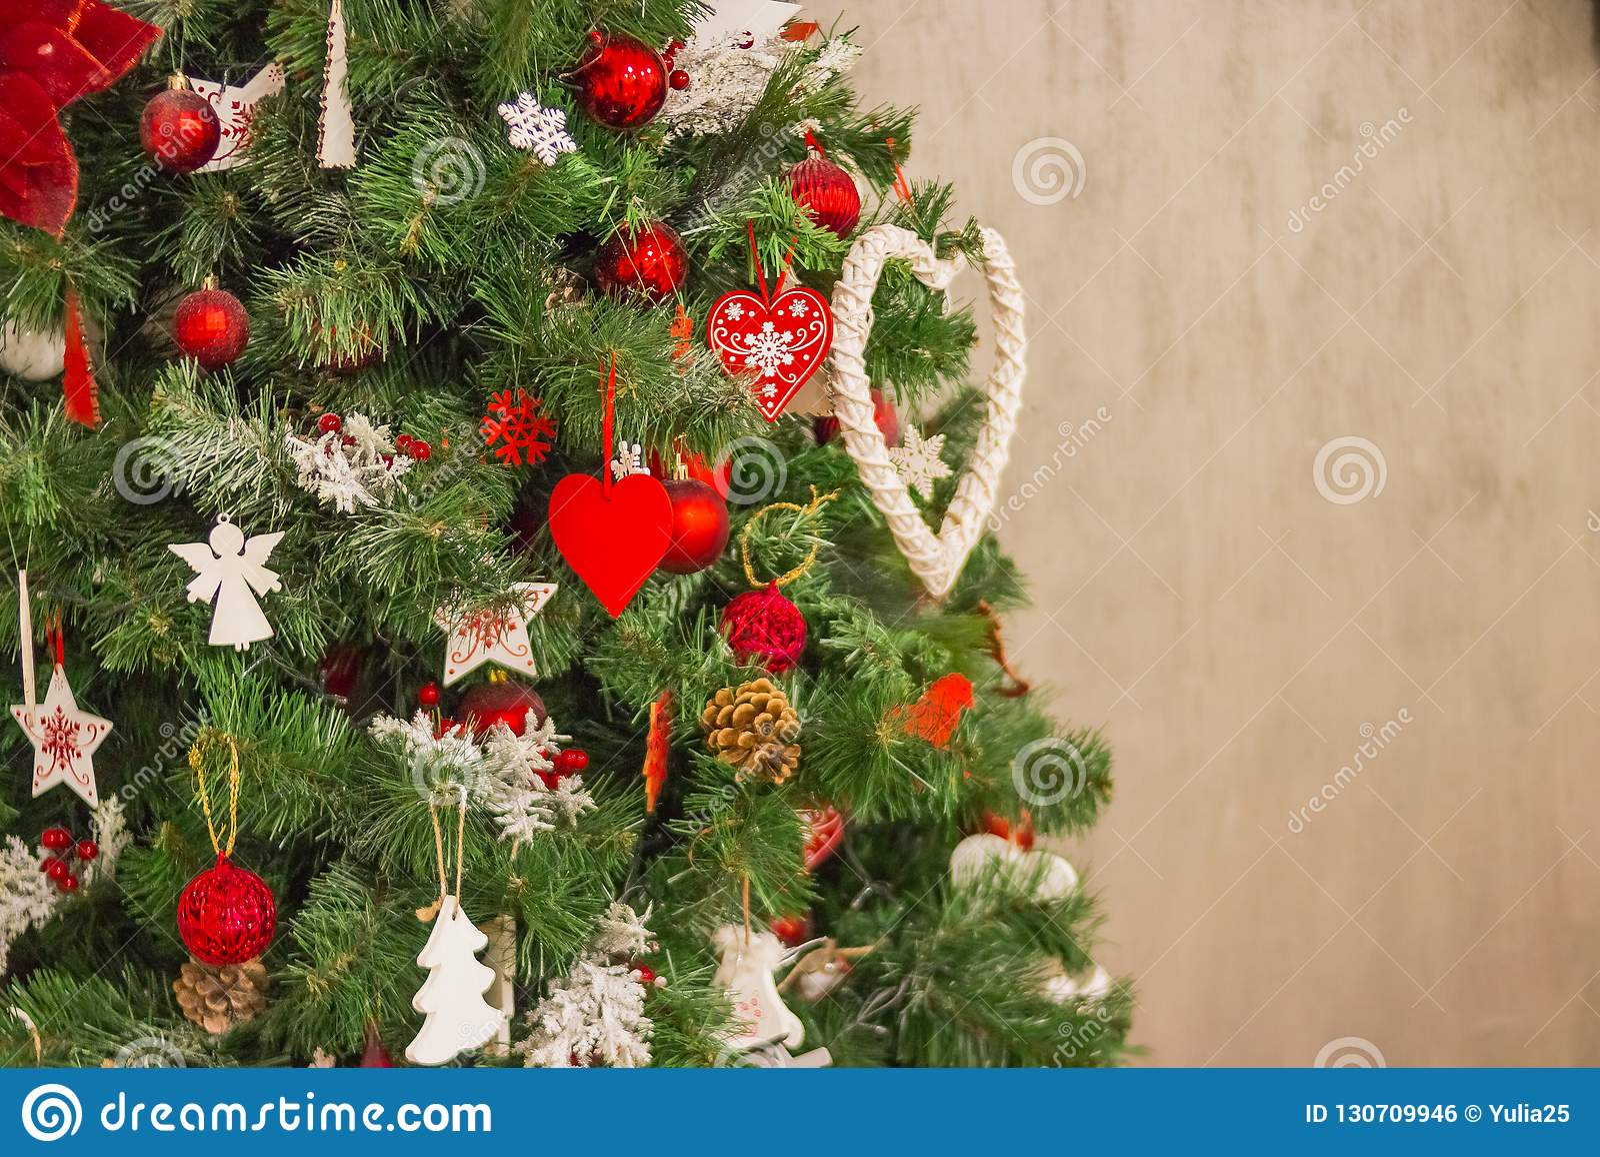 Christmas Tree Over Beige Wall Colorful Christmas